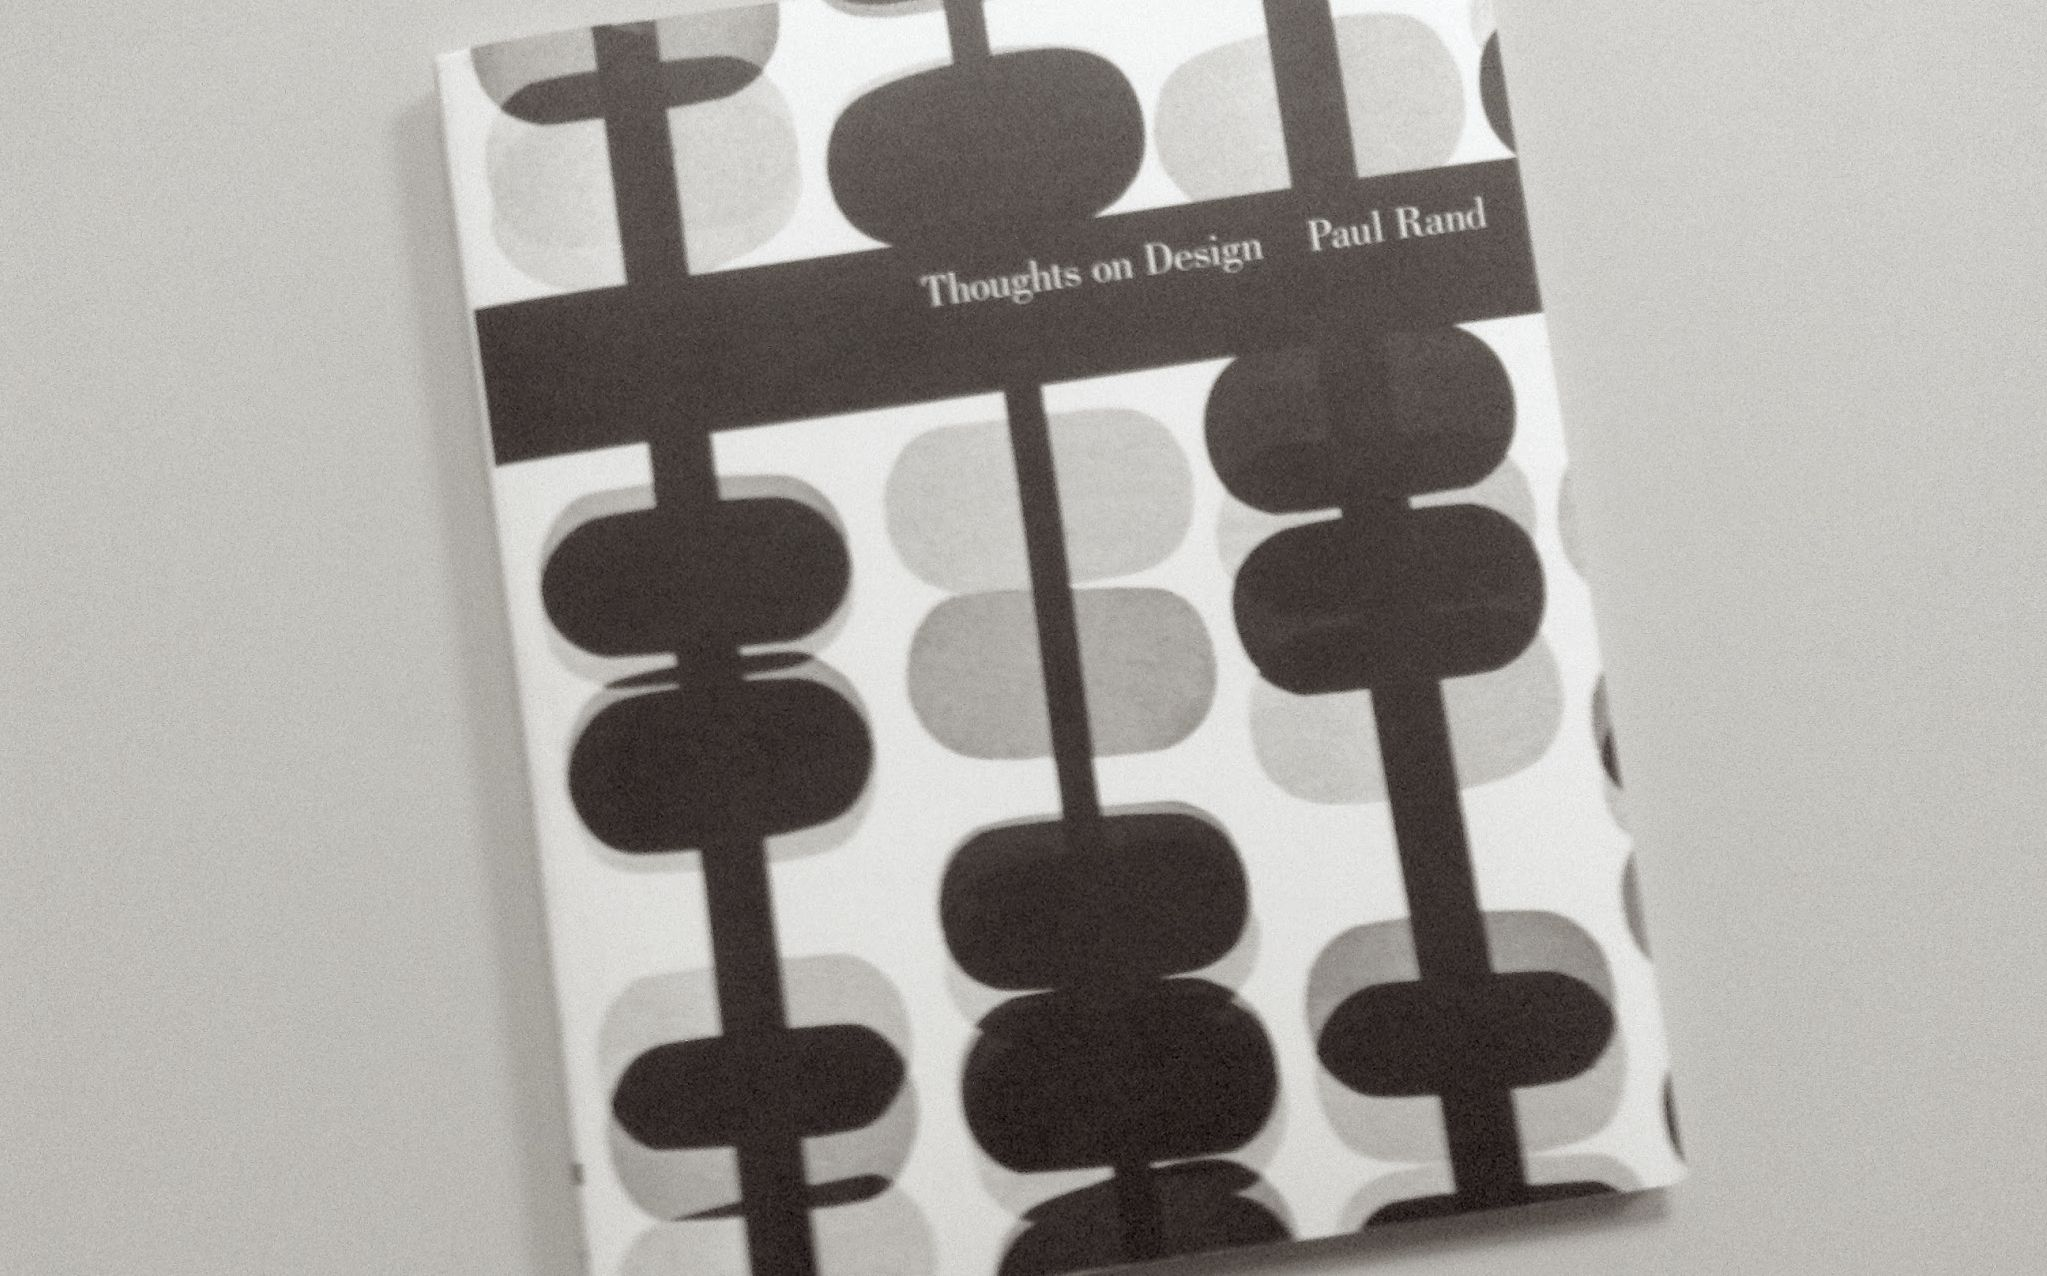 Thoughts on Design, par Paul Rand